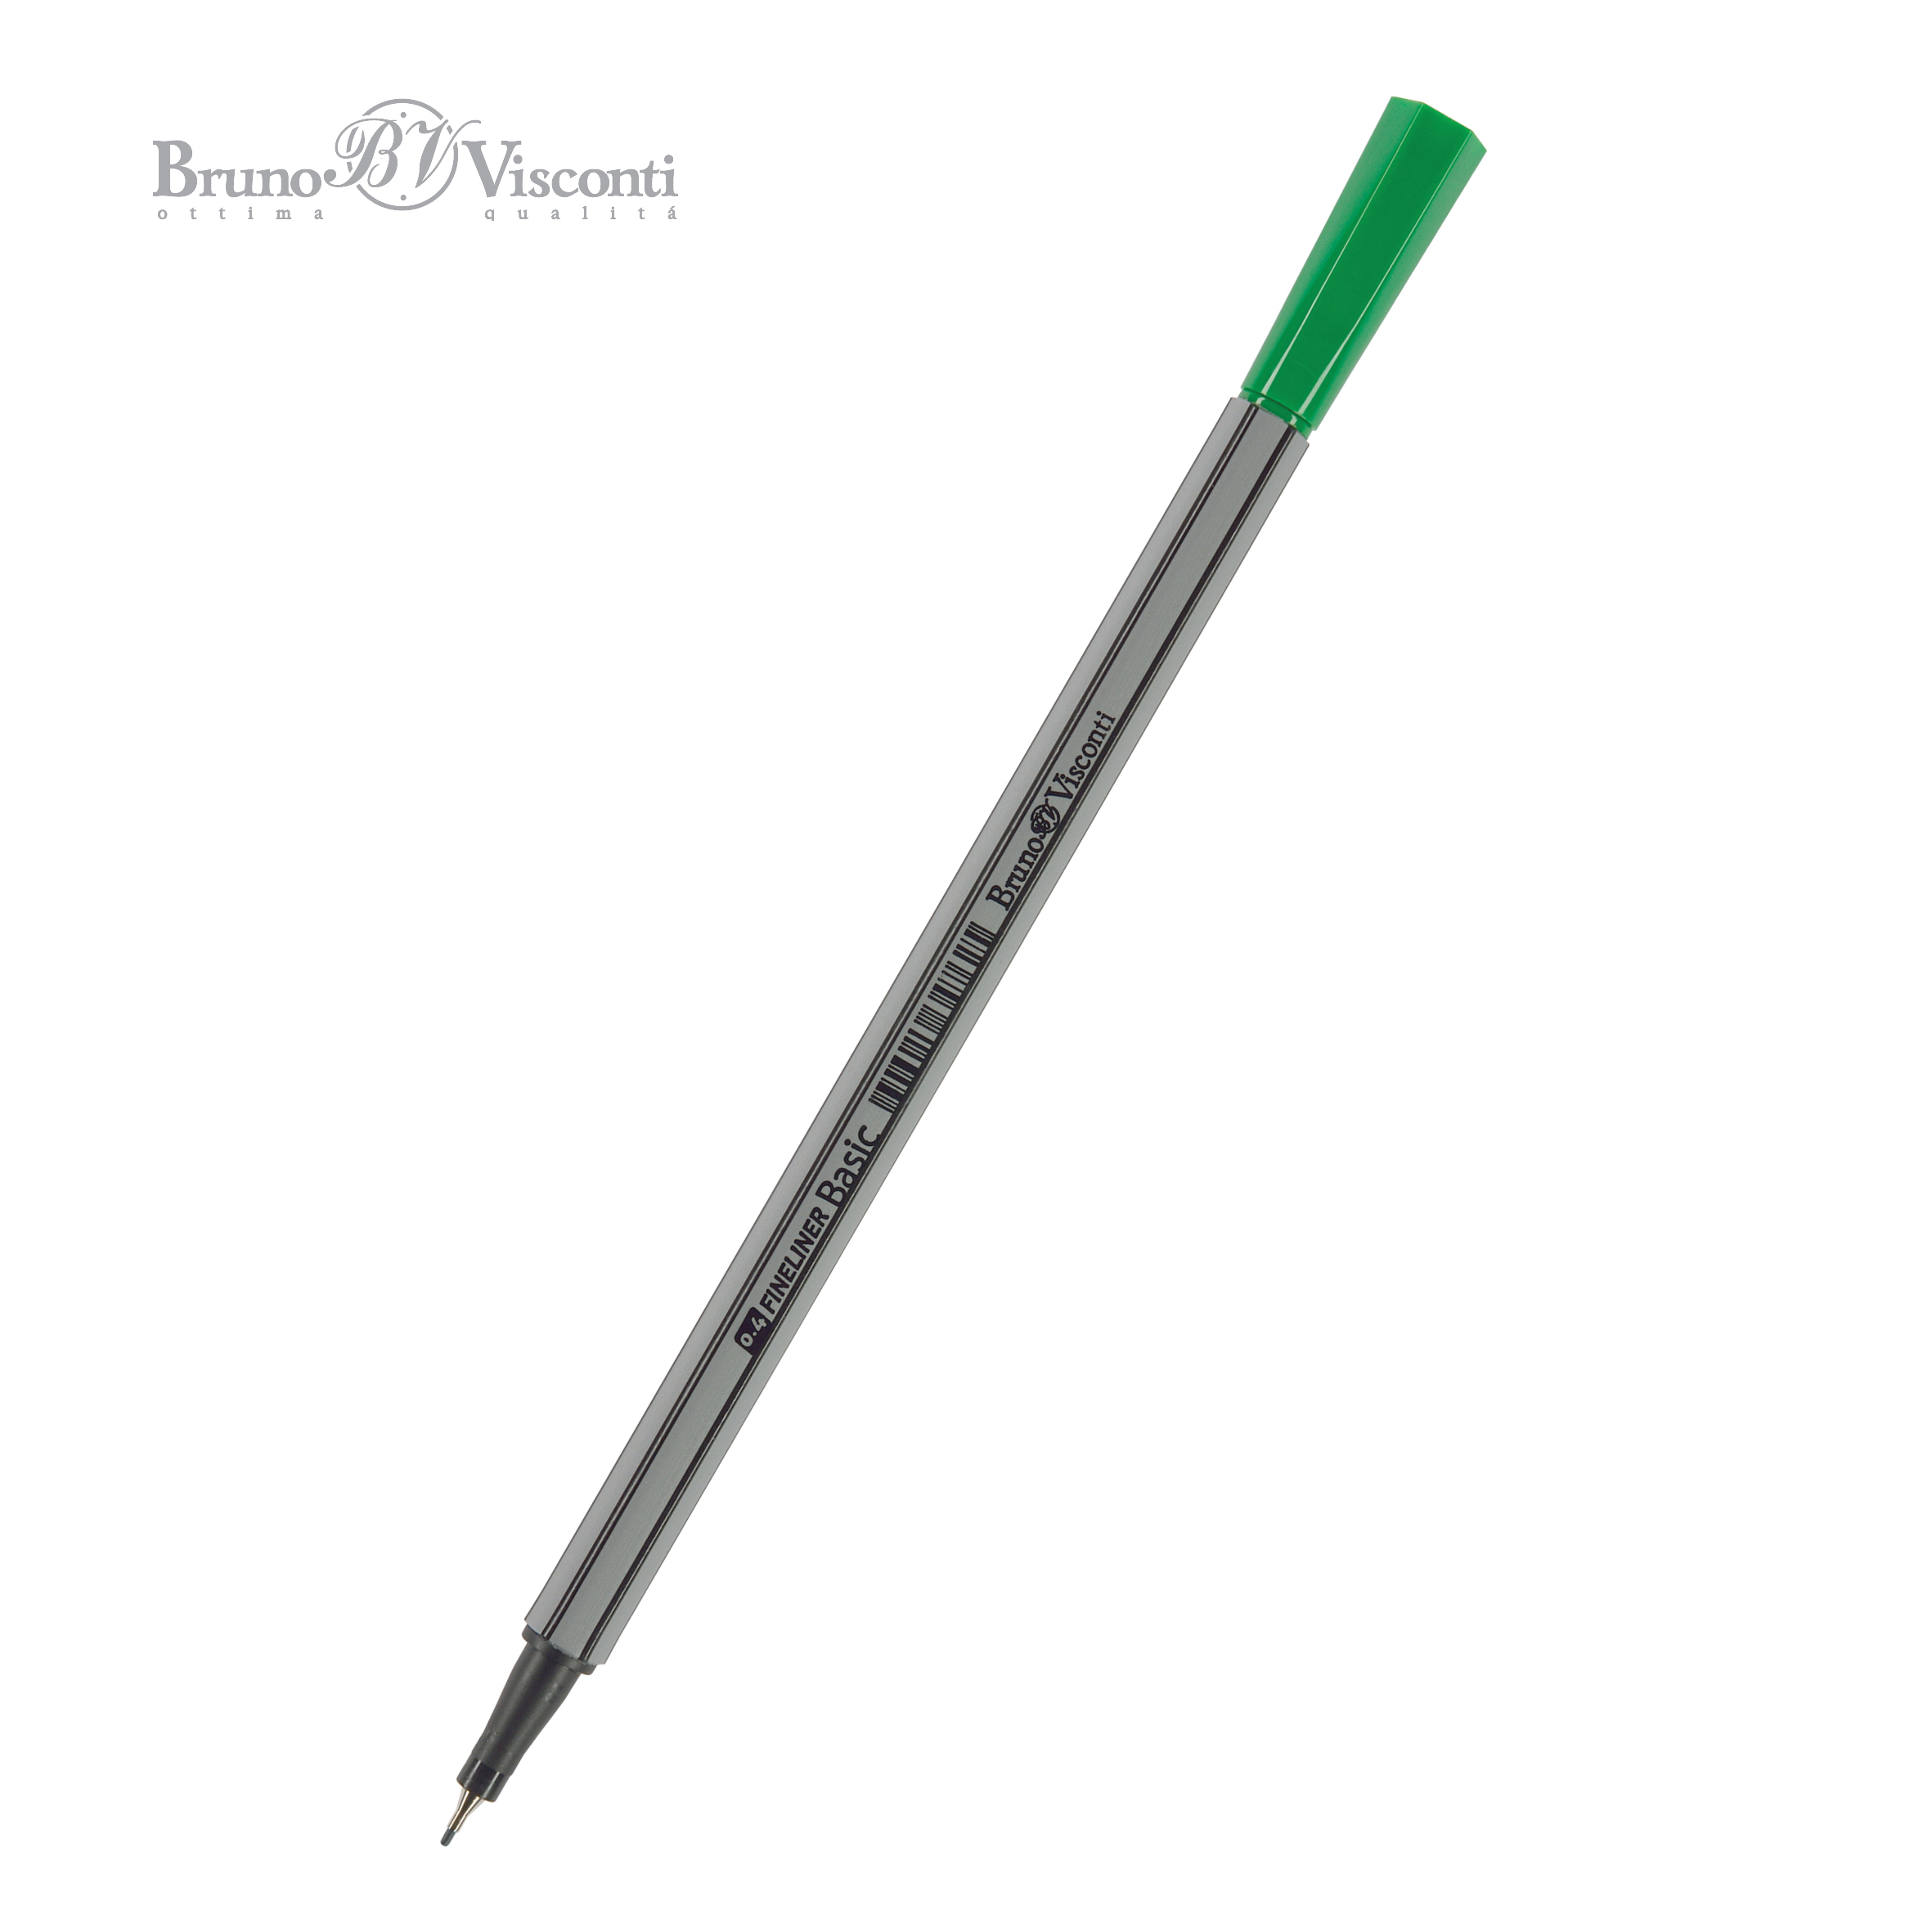 Ручка капиллярная Bruno Visconti Basic зеленая 0.4